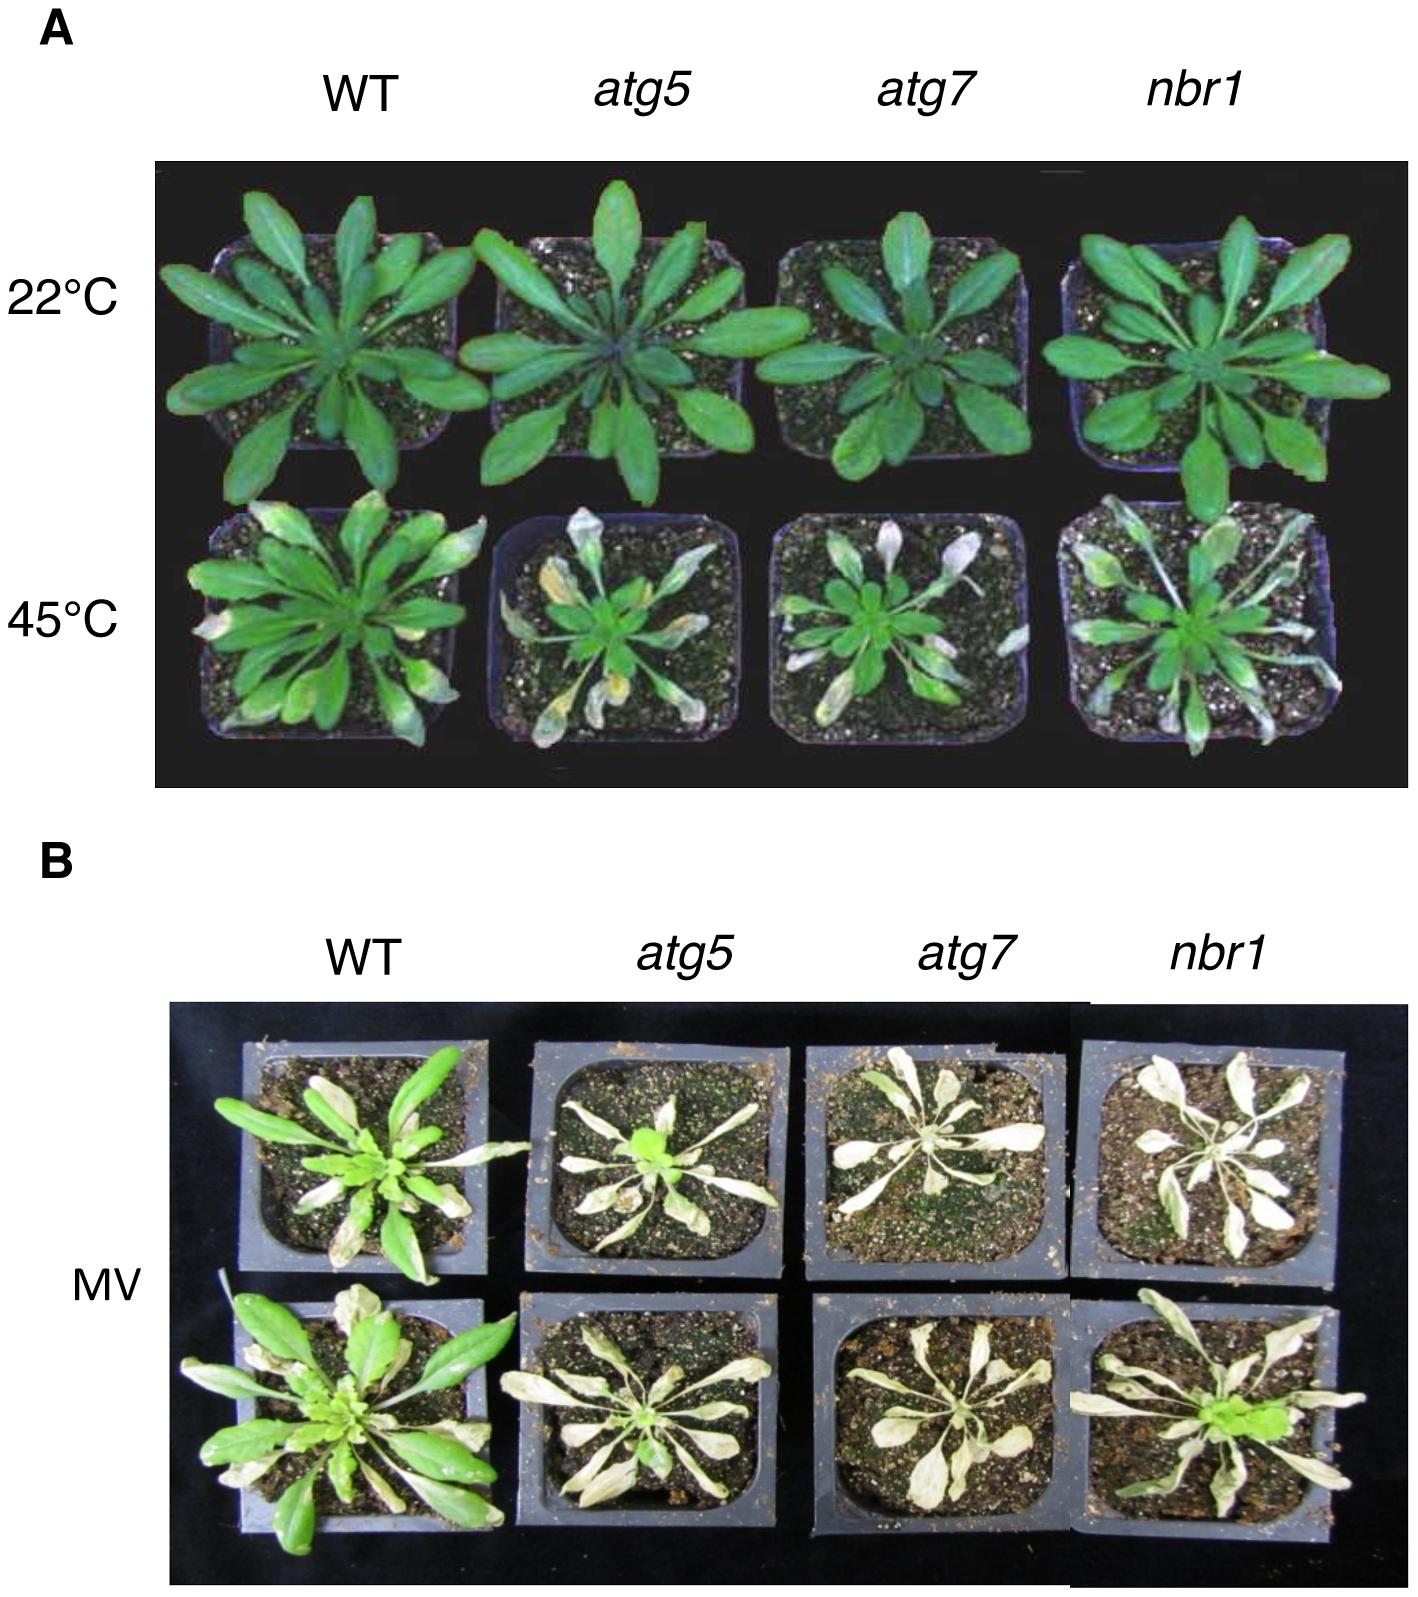 Enhanced sensitivity of <i>atg5</i>, <i>atg7</i> and <i>nbr1</i> mutants to heat and oxidative stresses.